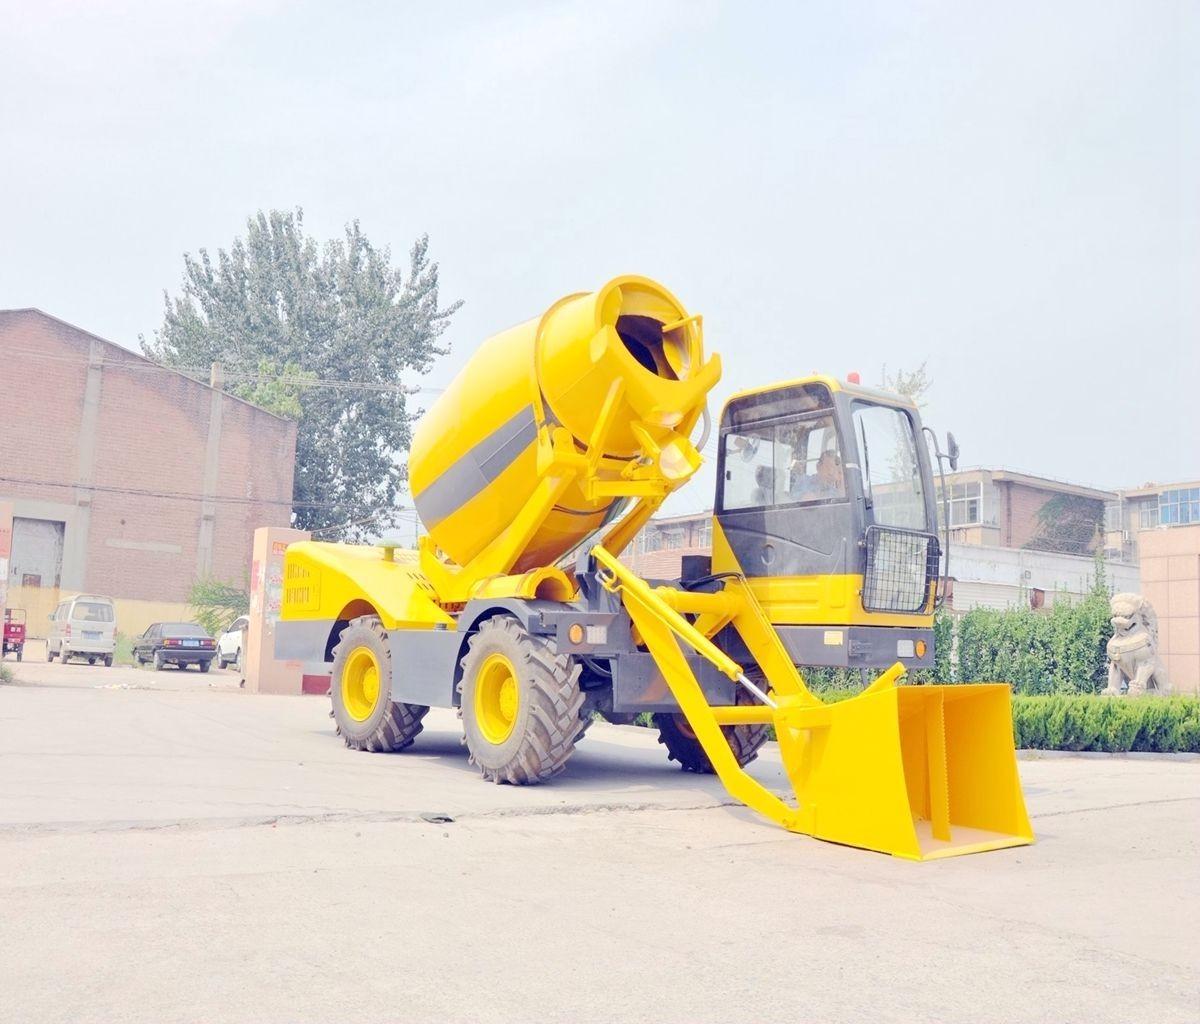 Sales Transiting Self Loading Concrete Mixer Diesel Engine, Buy Transiting Self Loading Concrete Mixer Diesel Engine, Transiting Self Loading Concrete Mixer Diesel Engine Factory, Transiting Self Loading Concrete Mixer Diesel Engine Brands